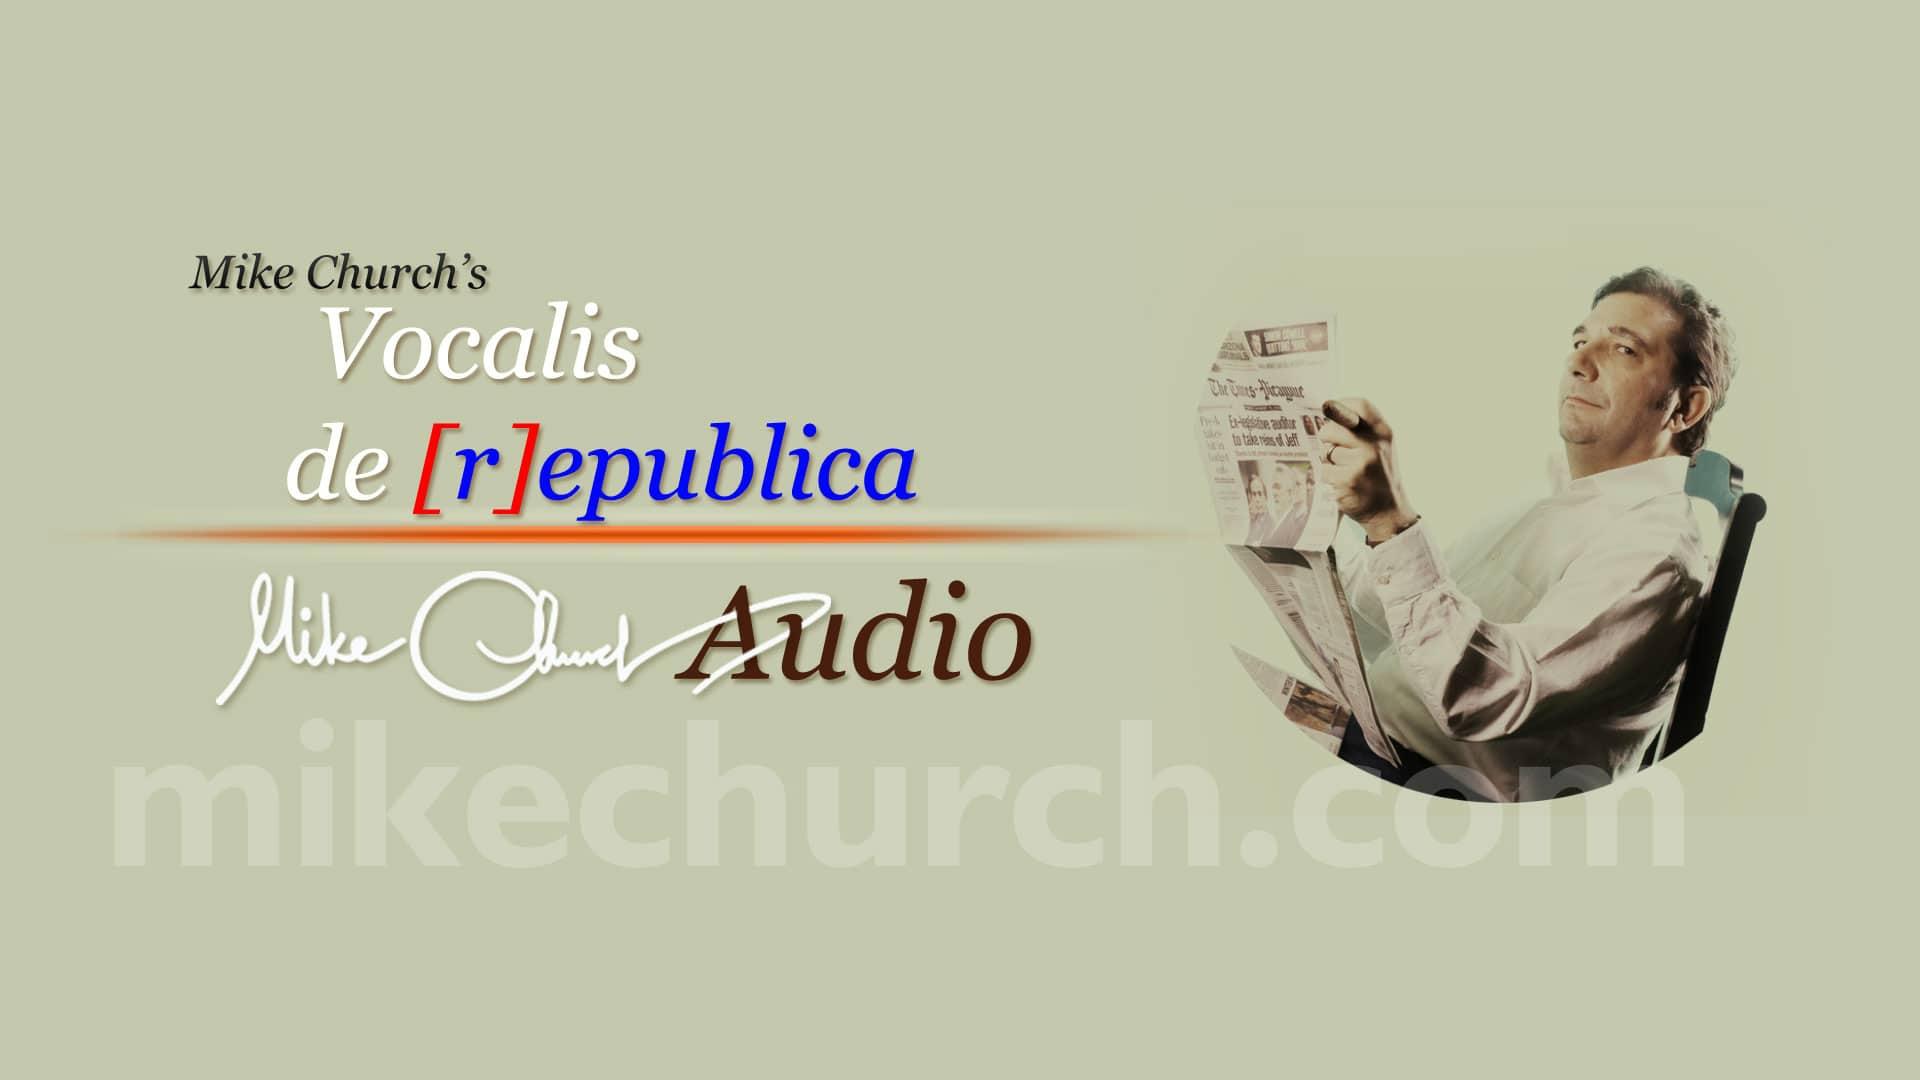 Trade conservatives for [r]epublica's